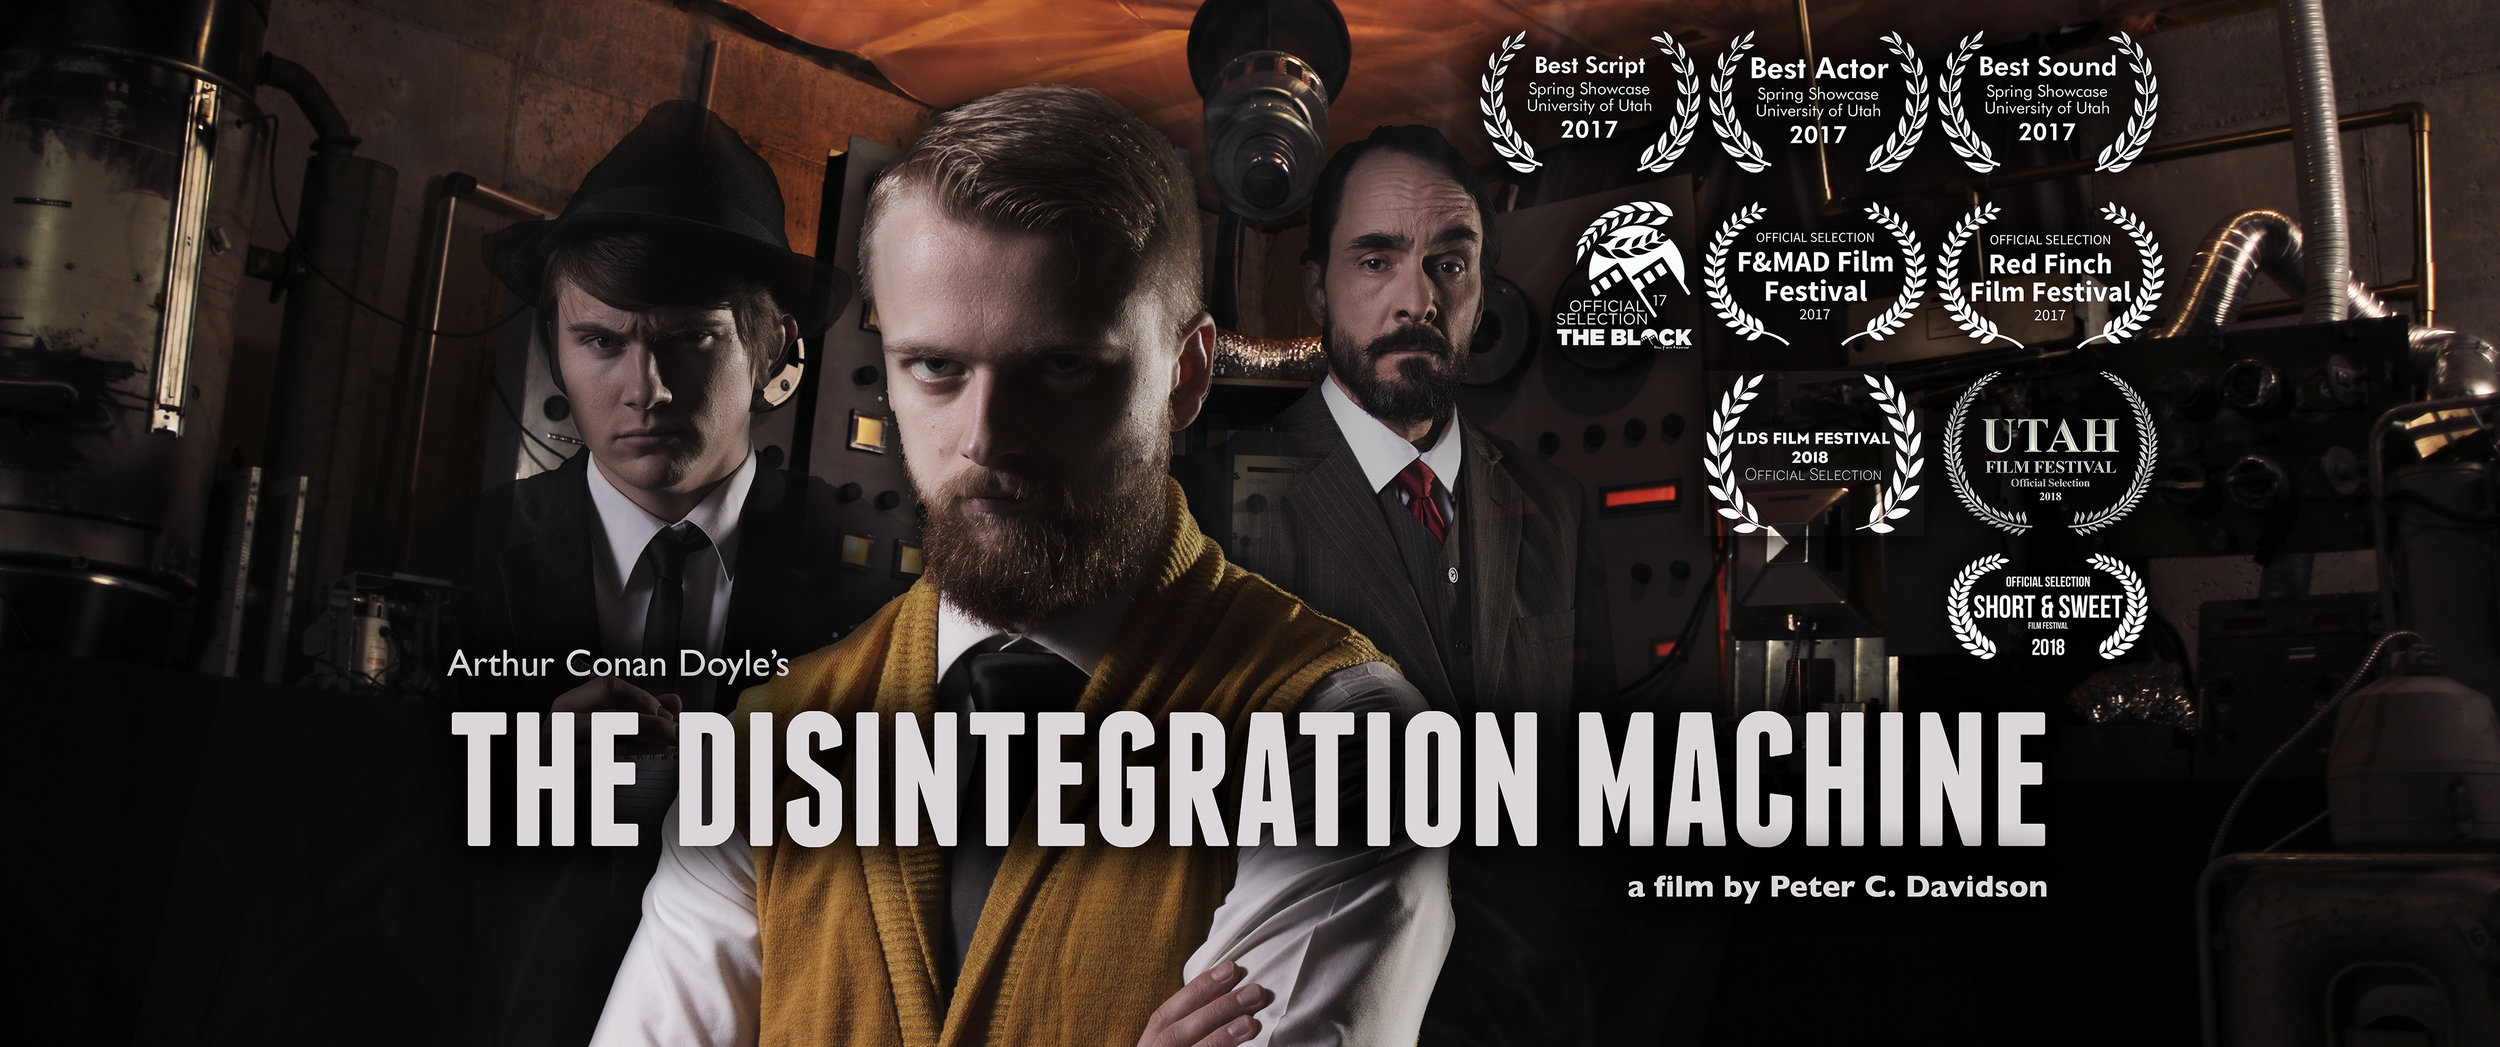 The Disintegration Machine.jpg